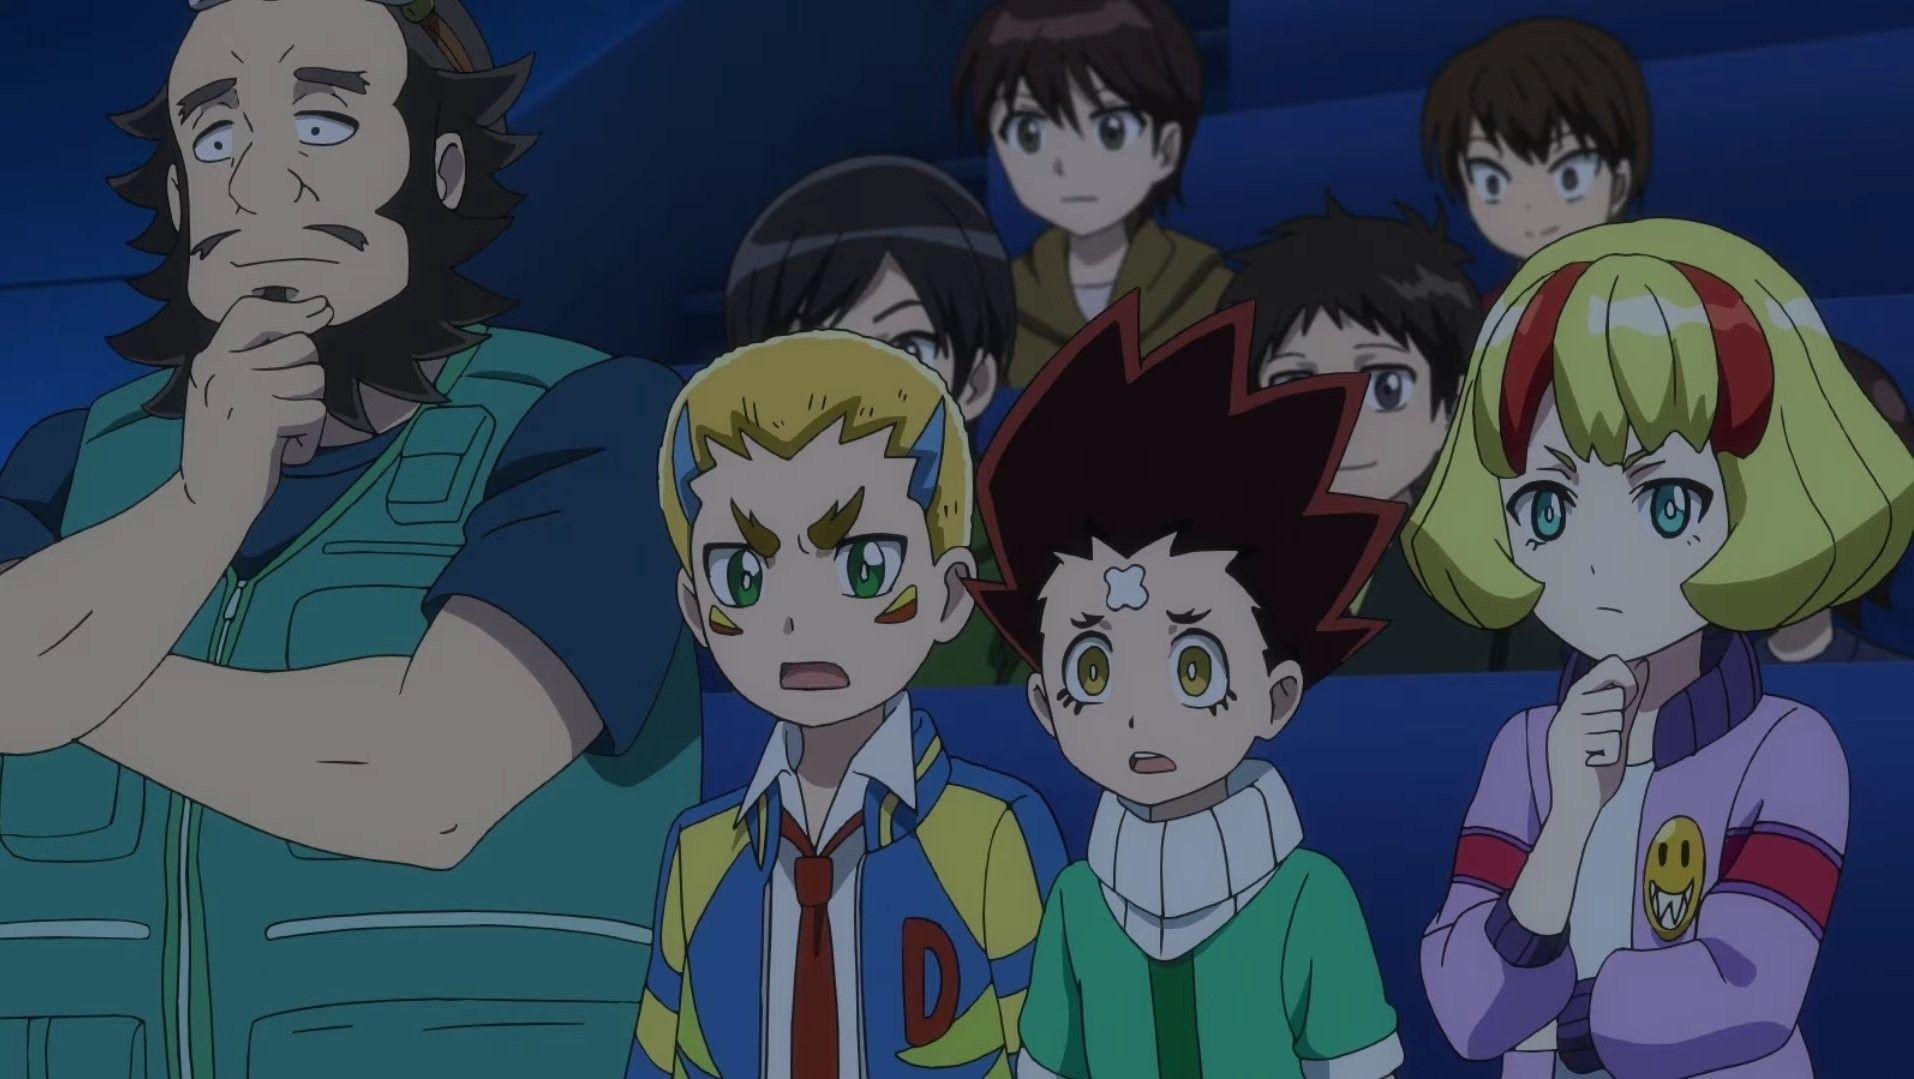 Pin by anime4ever on Beyblade Burst/Bakugan Battle